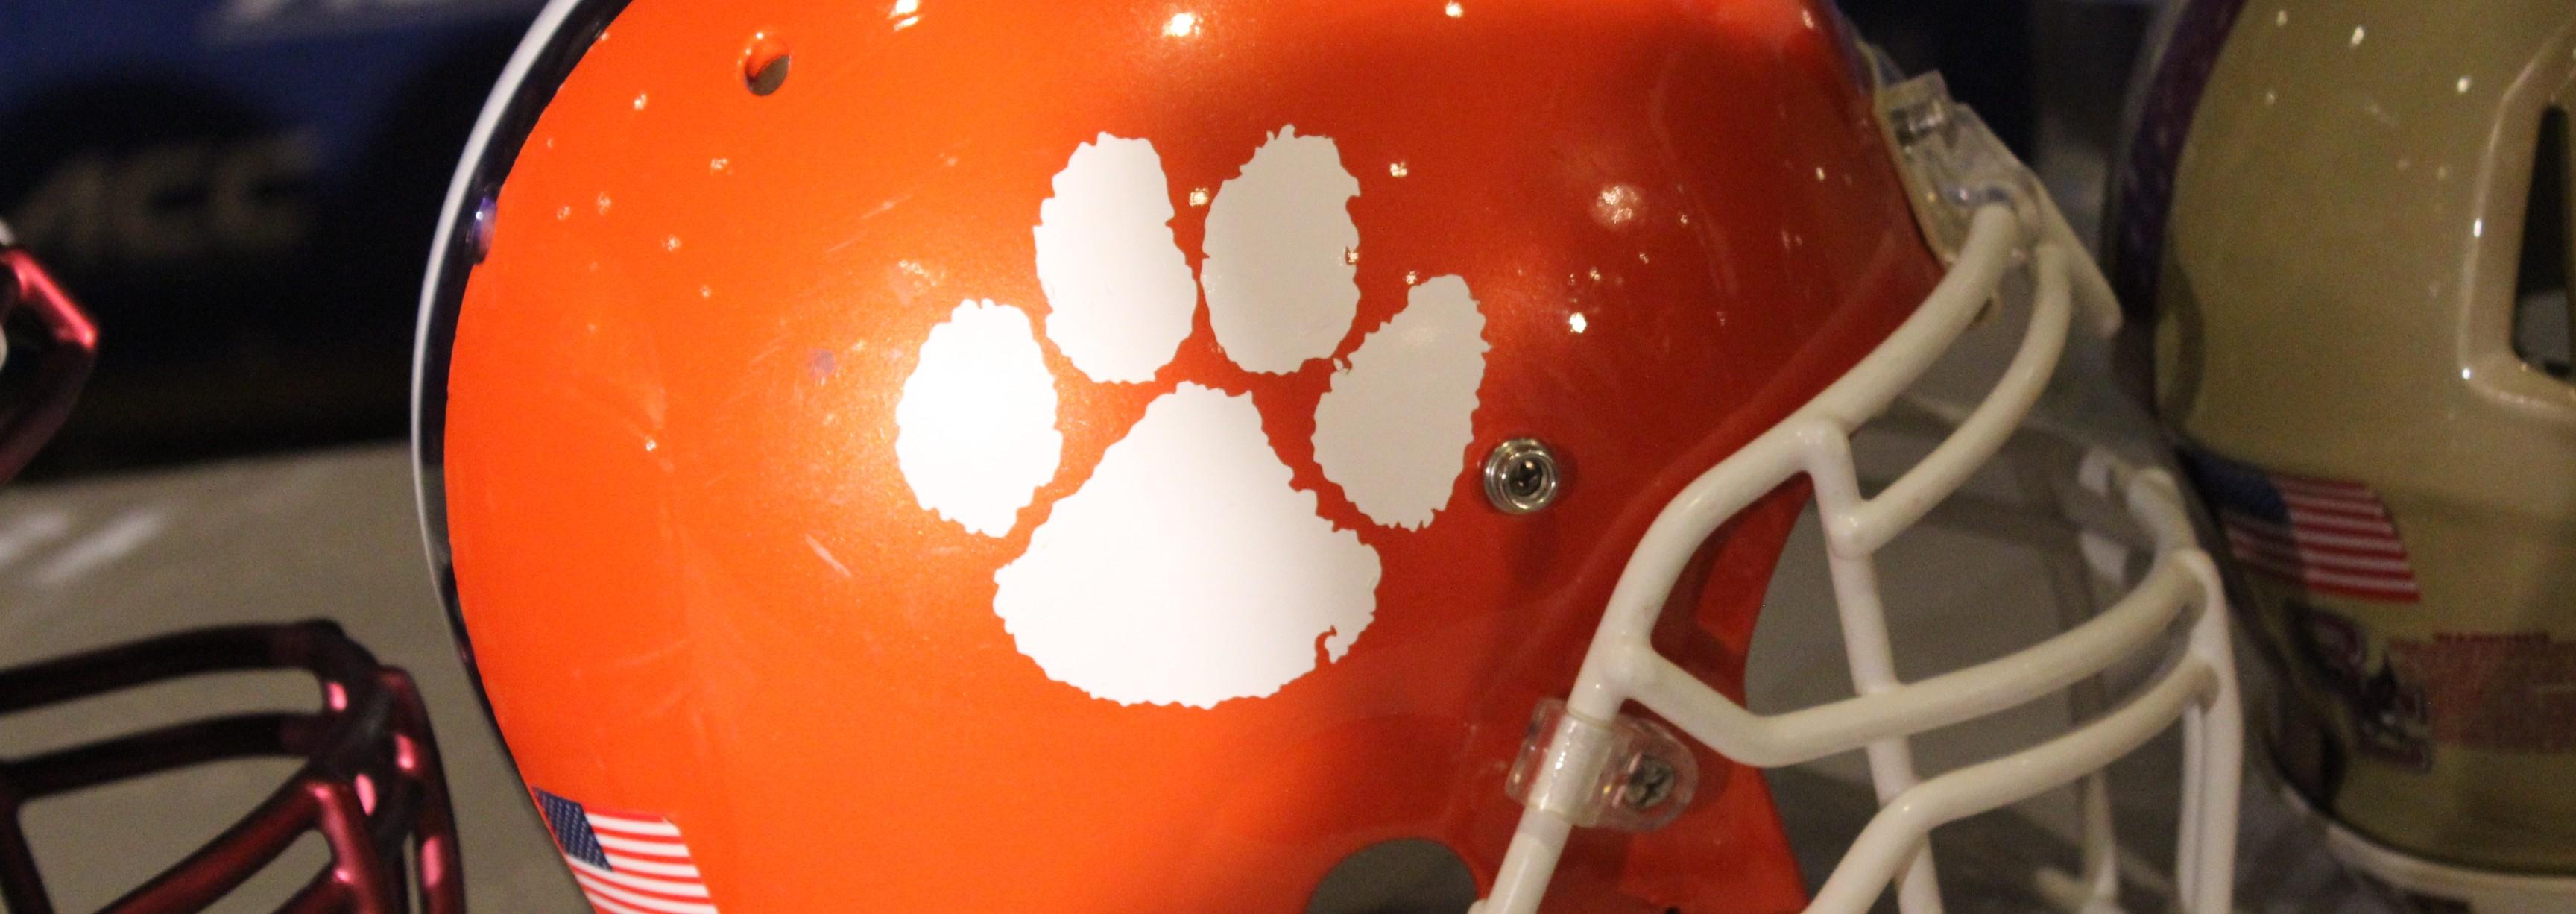 Clemson Helmet Fitted 2014 ACC Kickoff Photo by Mark Blankenbaker